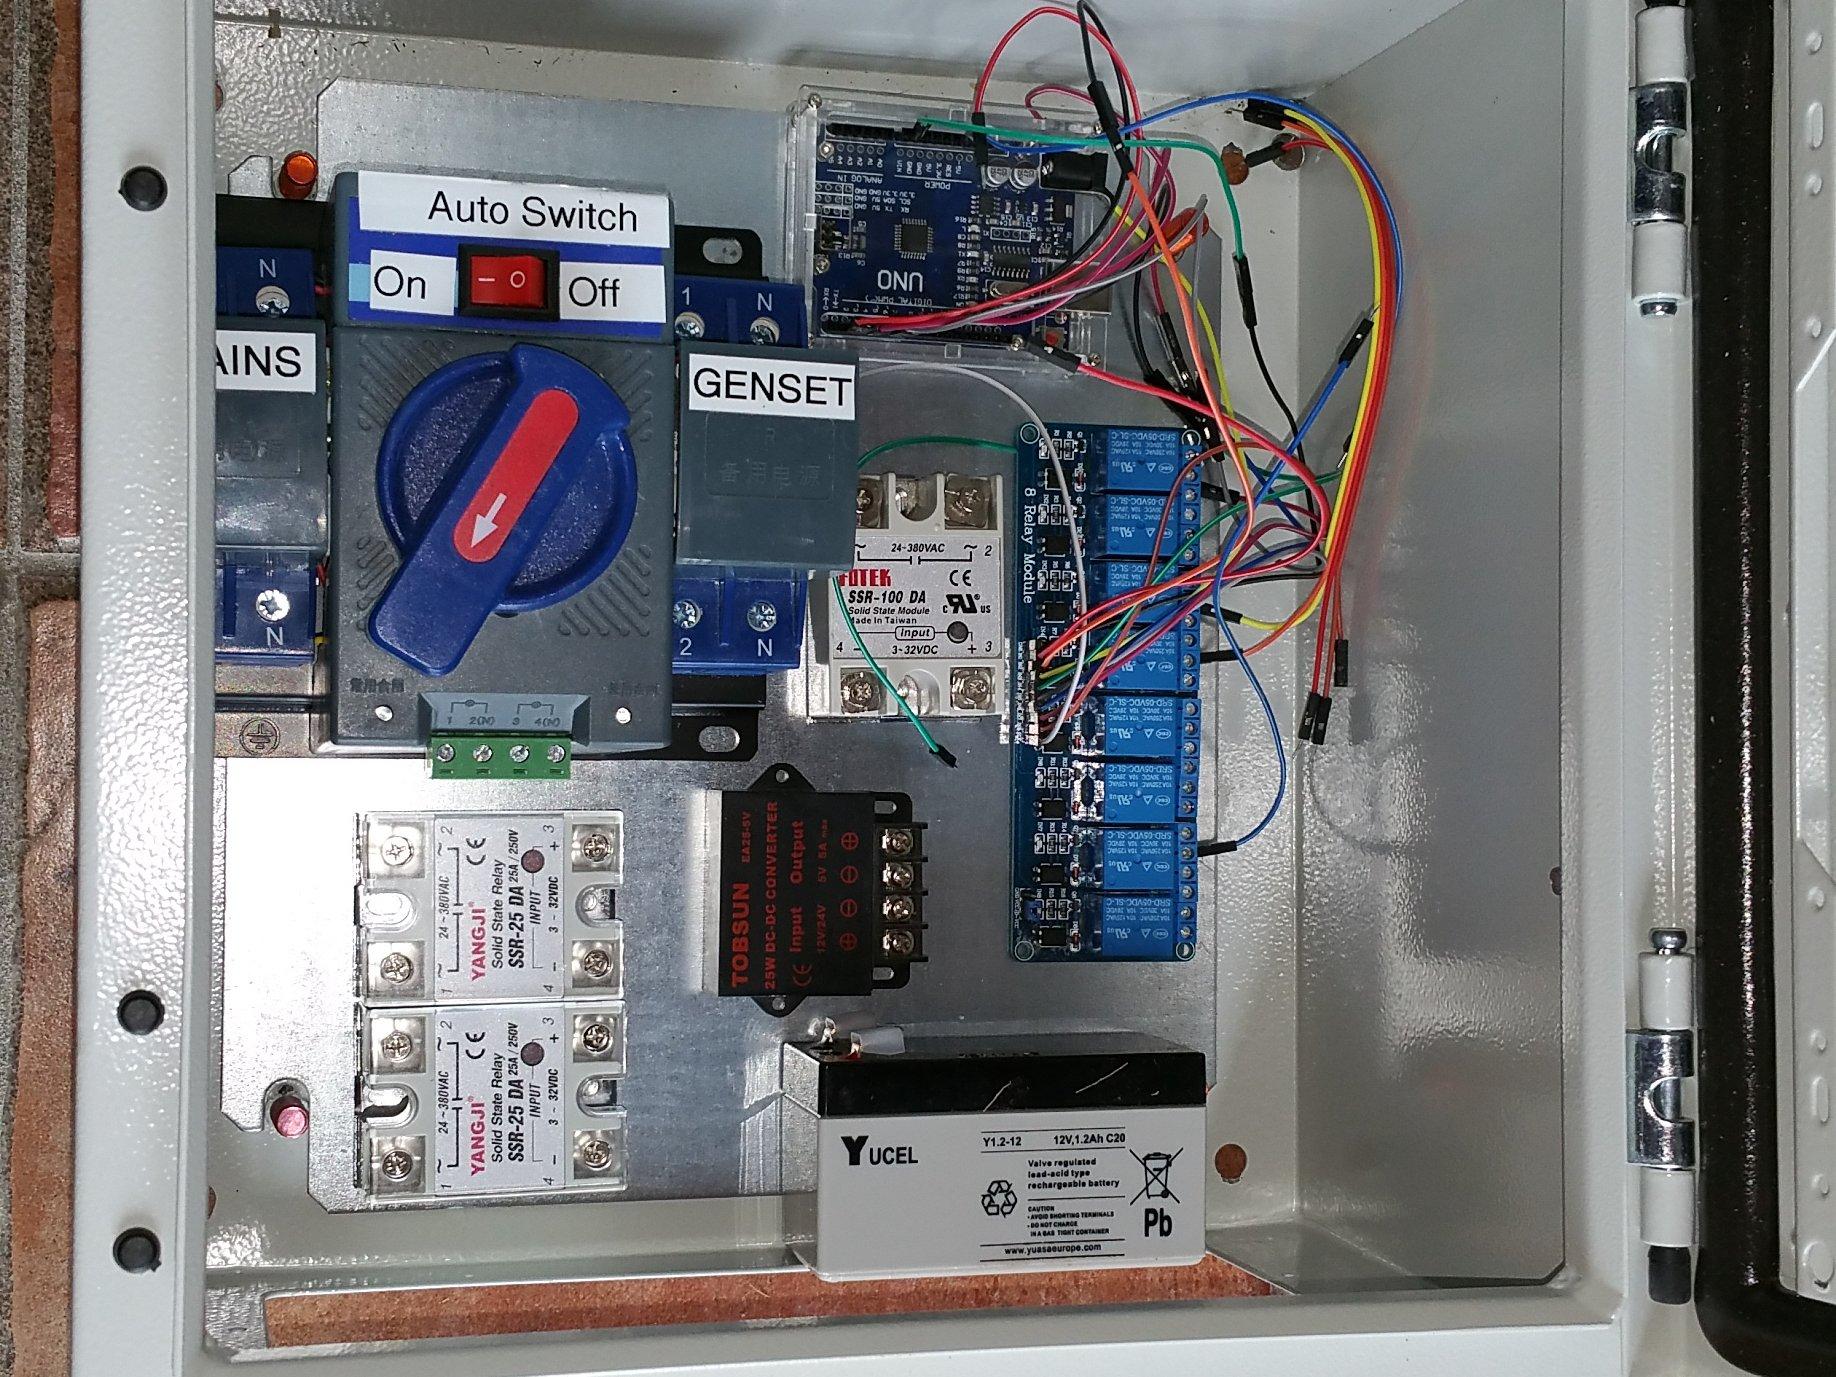 230v generator wiring diagram 2002 honda civic transmission ats - hackster.io